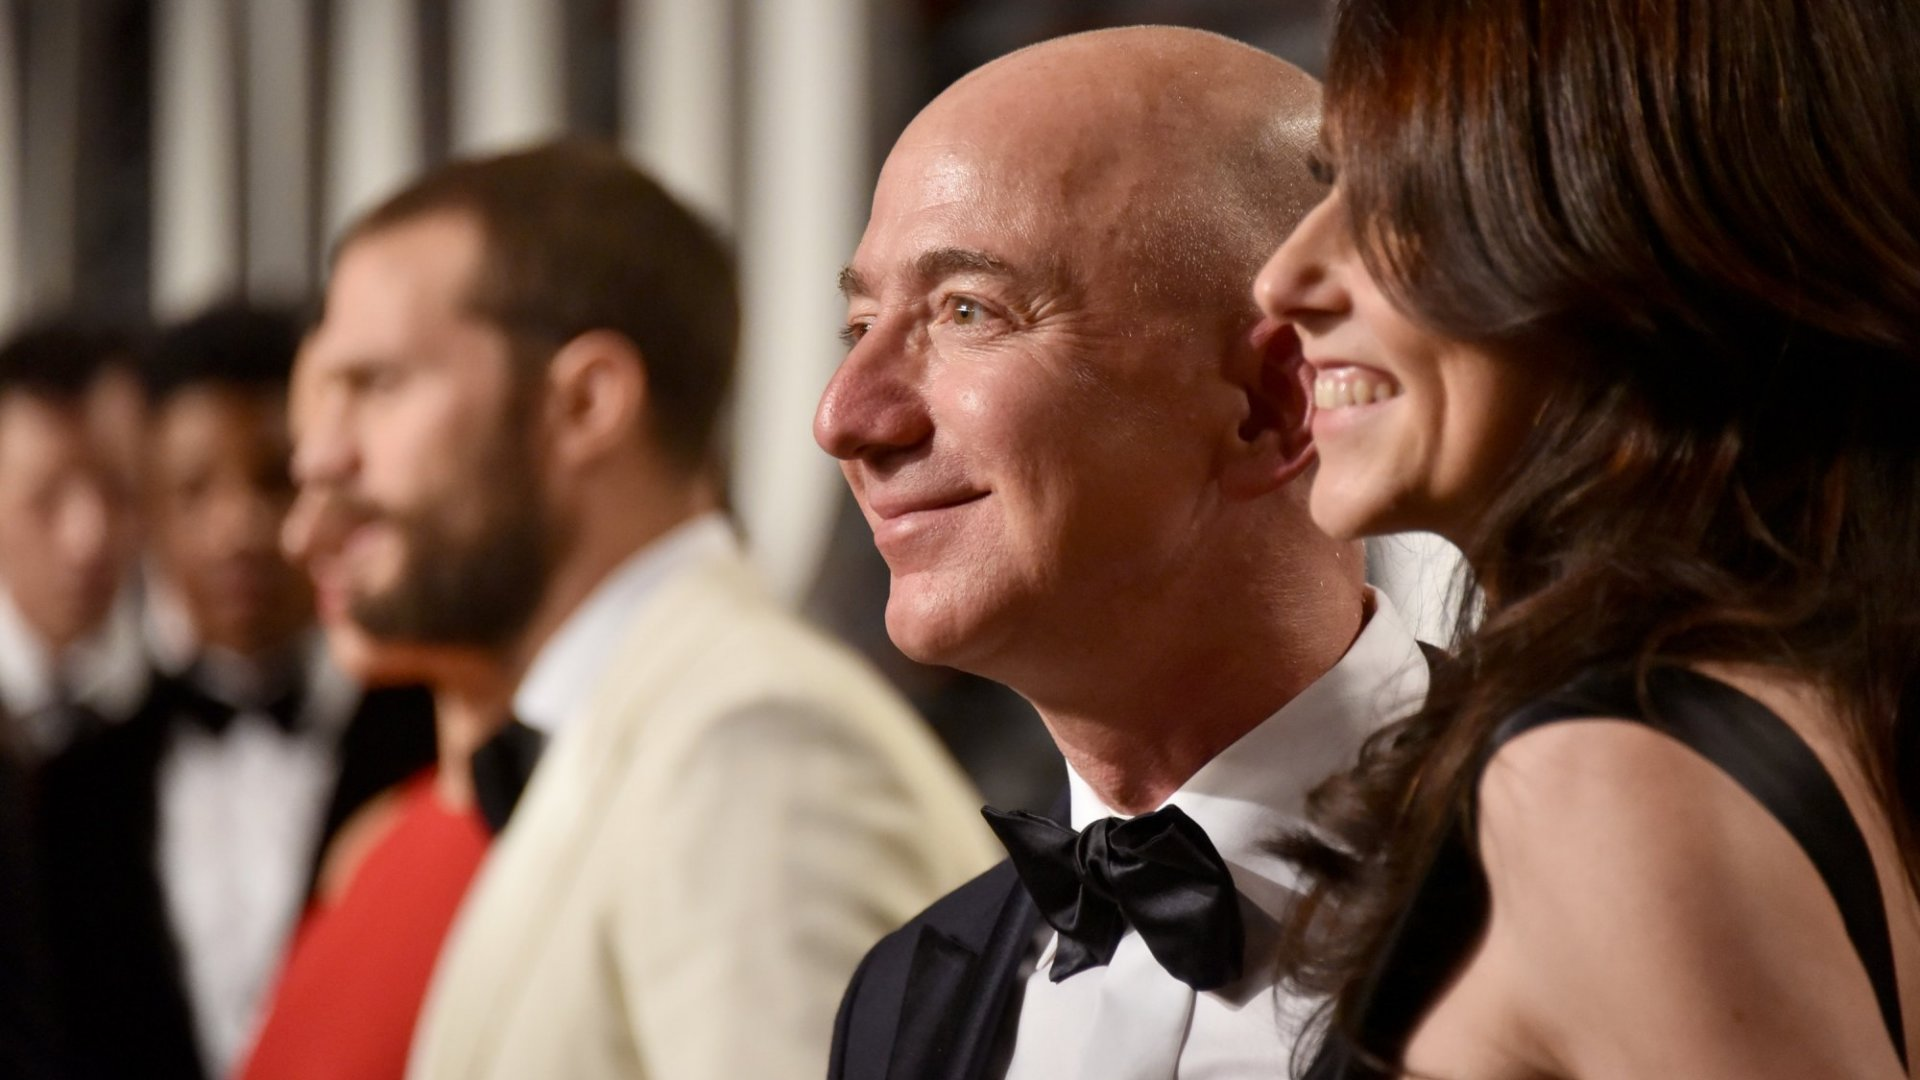 Last Night, Jeff Bezos Became the Silicon Valley Titan Who Won the Oscars